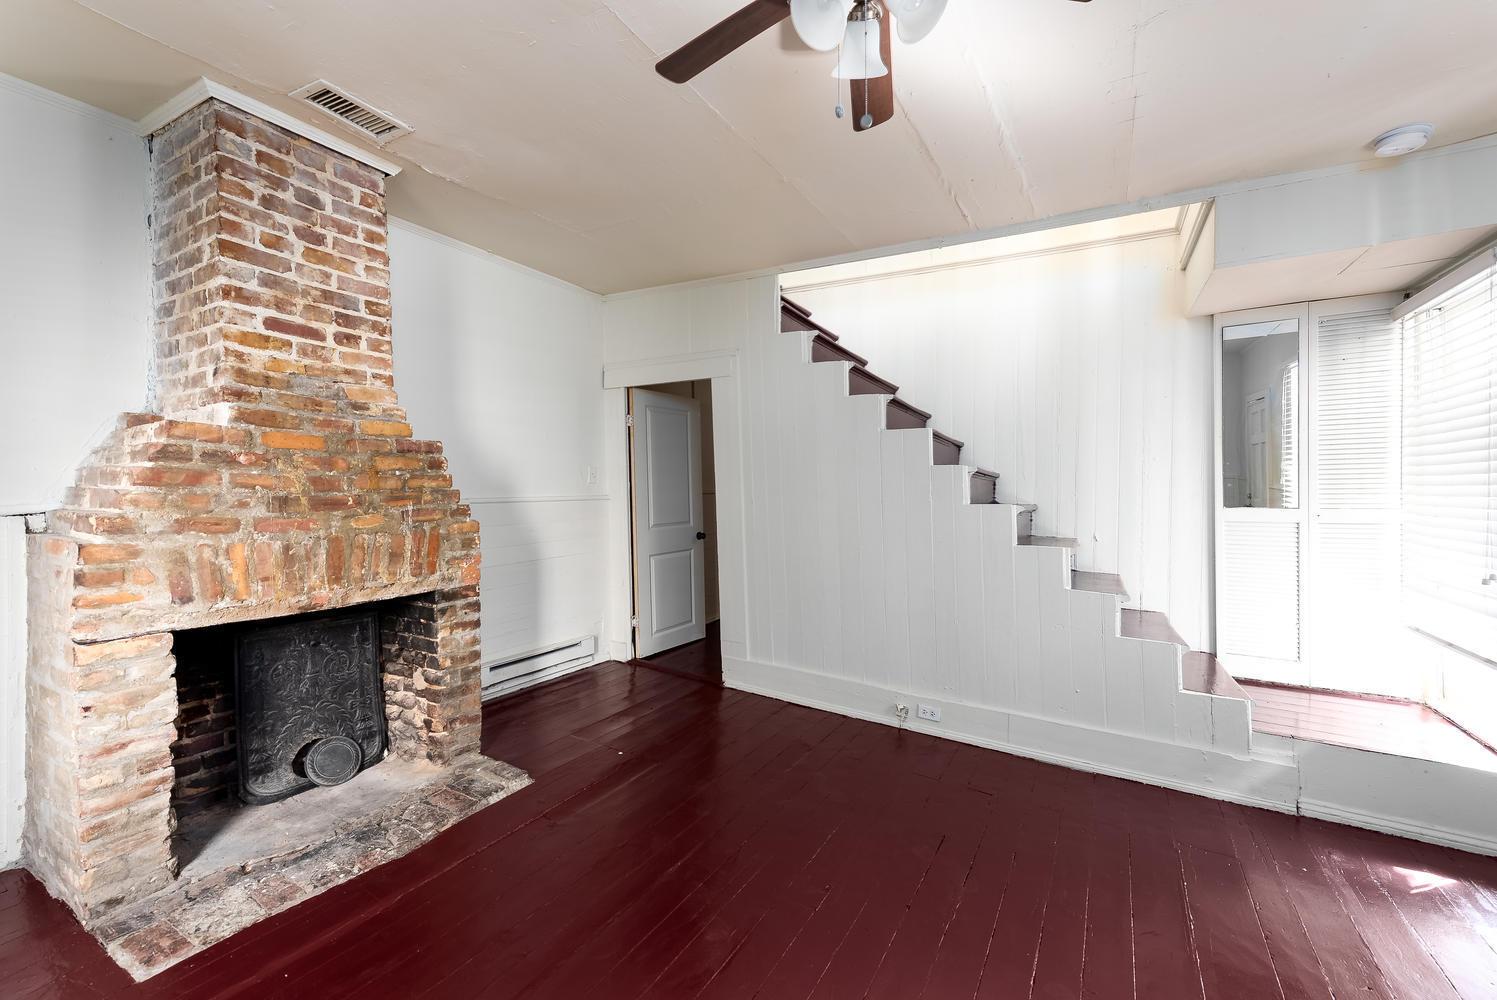 Radcliffeborough Homes For Sale - 73 Pitt, Charleston, SC - 0